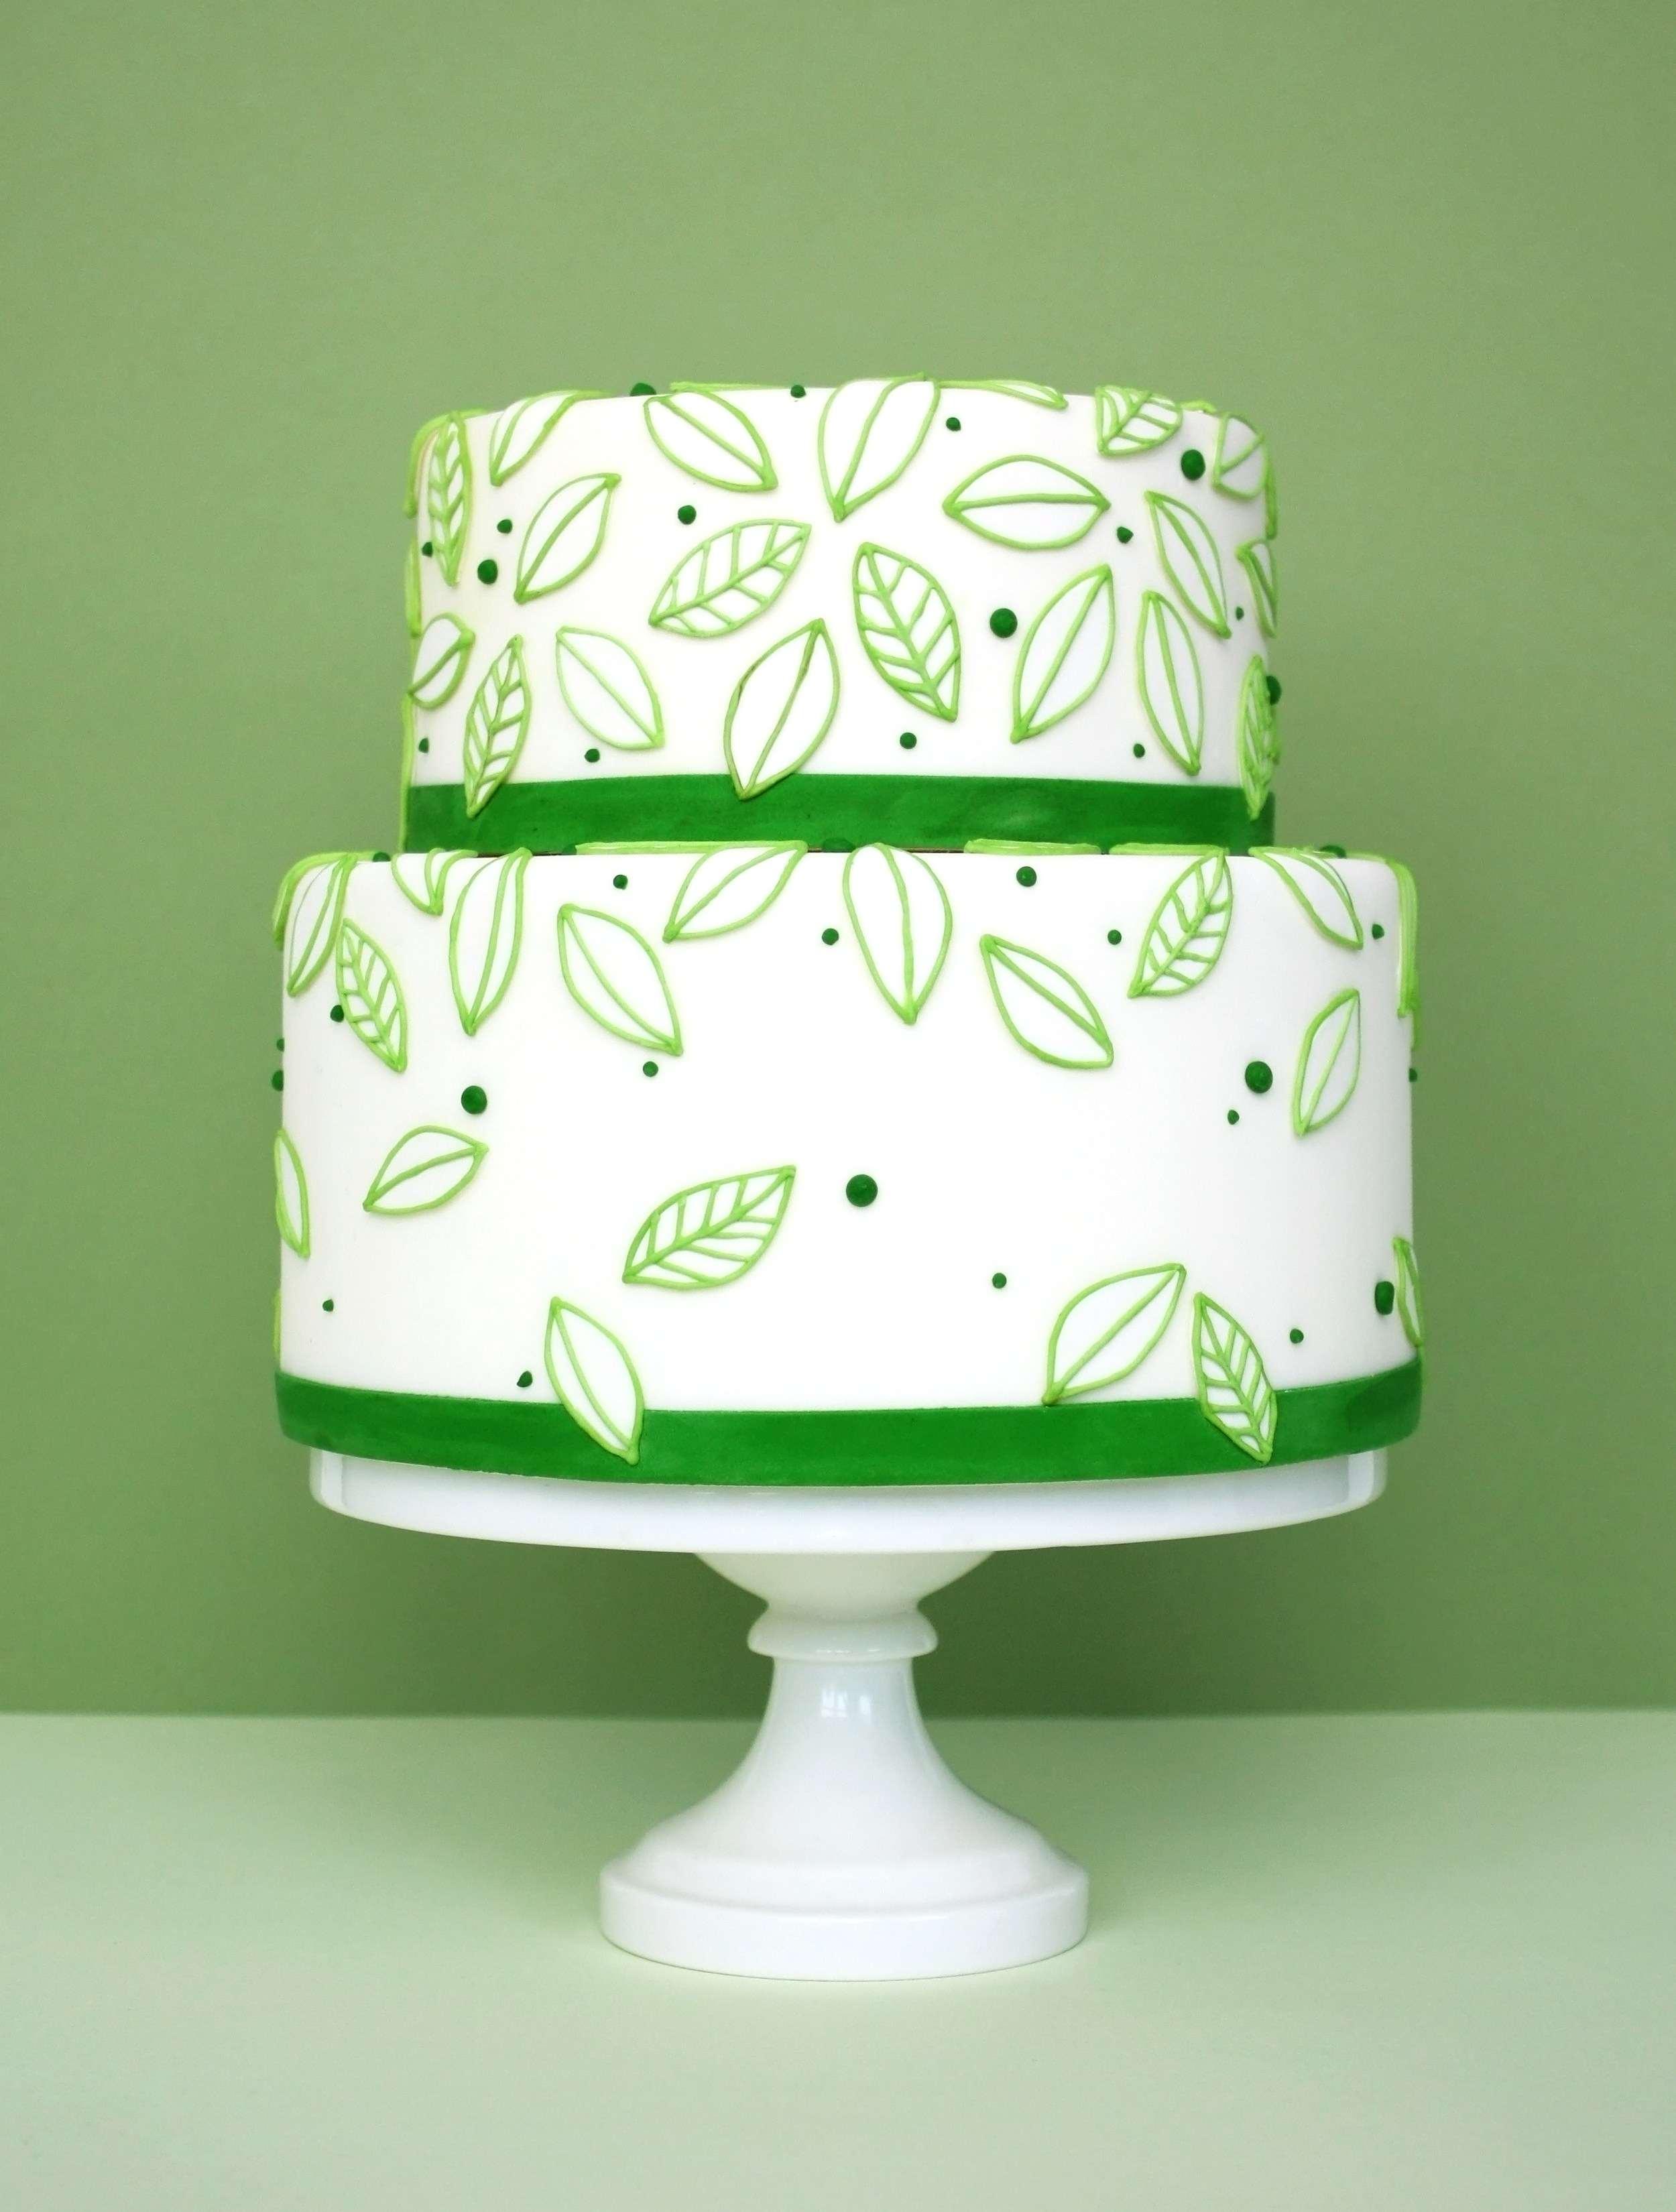 eatcakebemerry_modern_leaves_cake.jpg